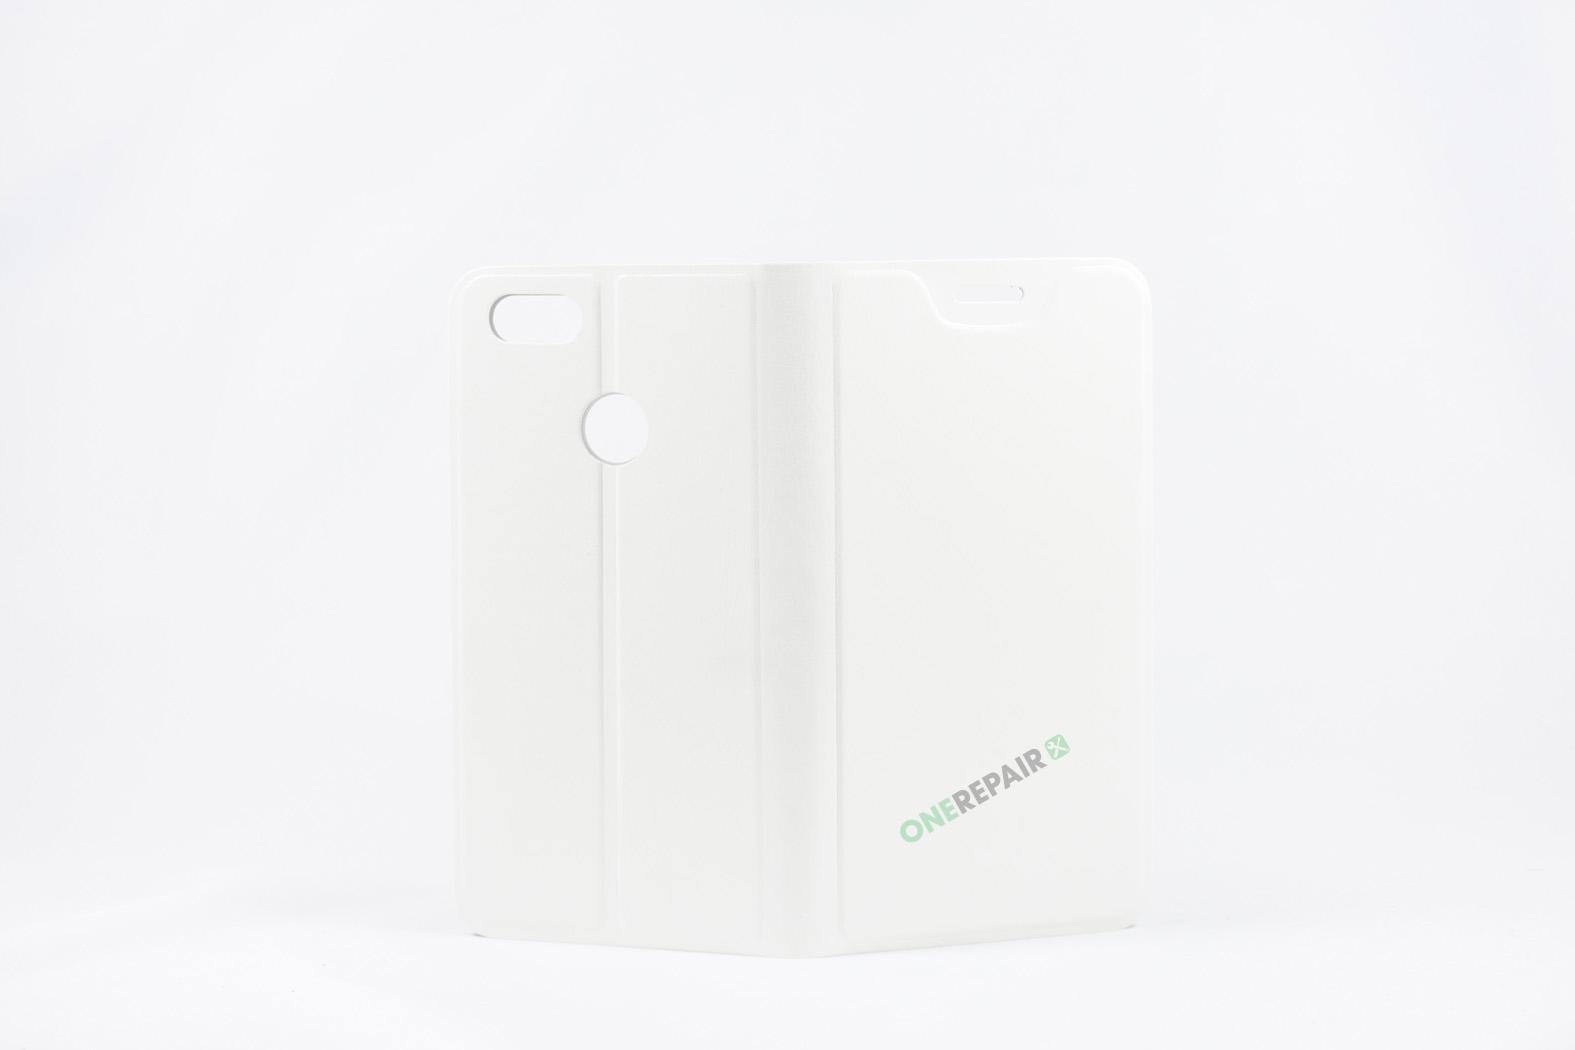 350944_Huawei_P_9_Lite_Mini_Flipcover_Thin_Hvid_OneRepair_00003